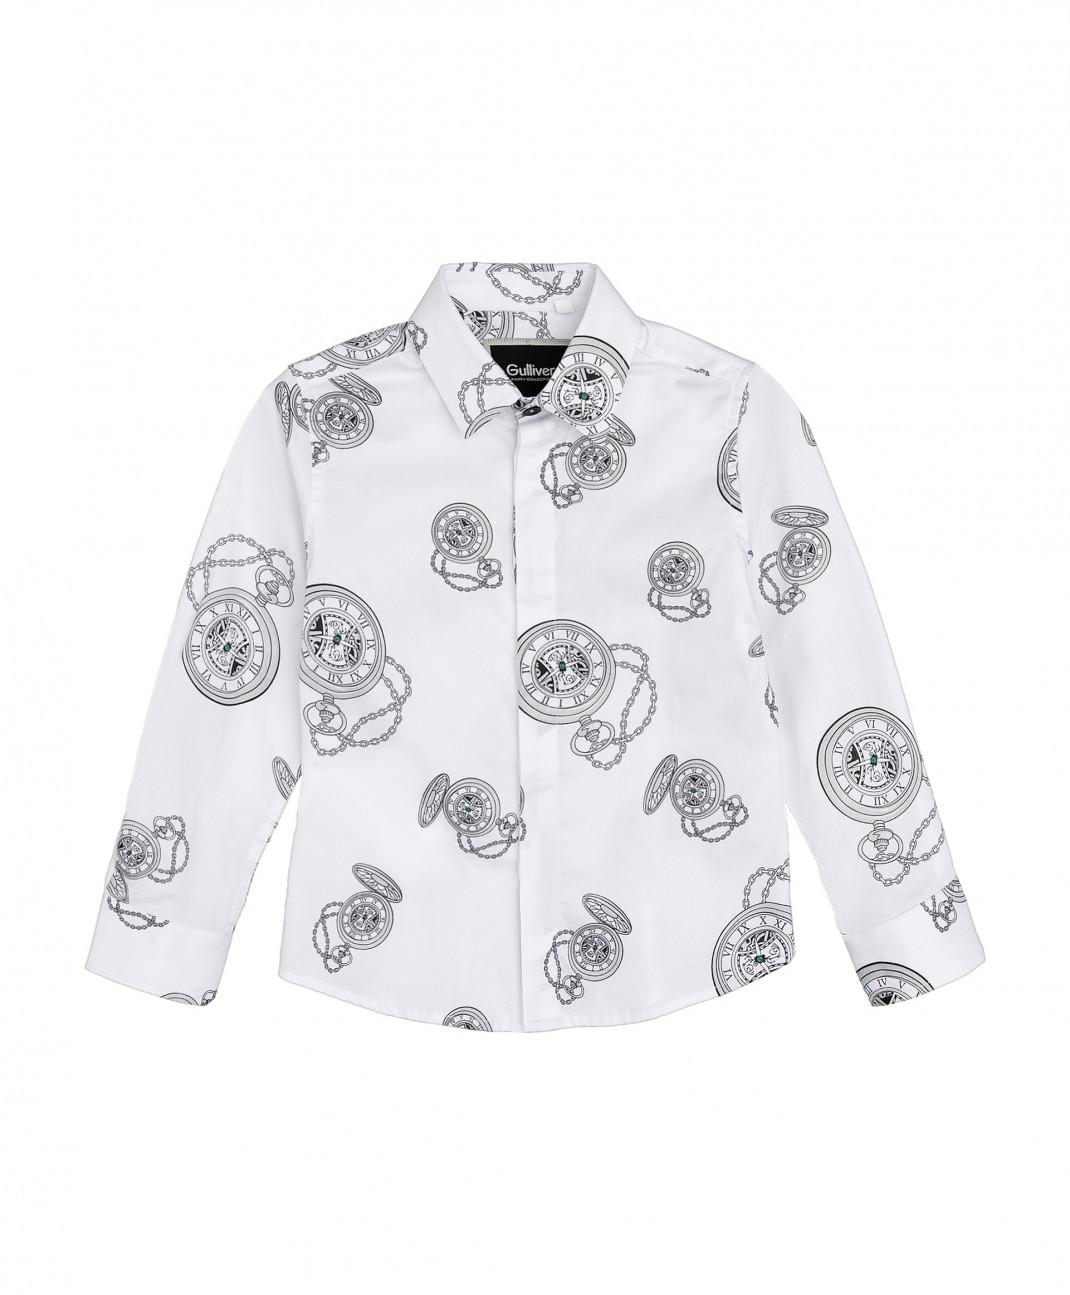 Gulliver Baby Белая рубашка с орнаментом Gulliver